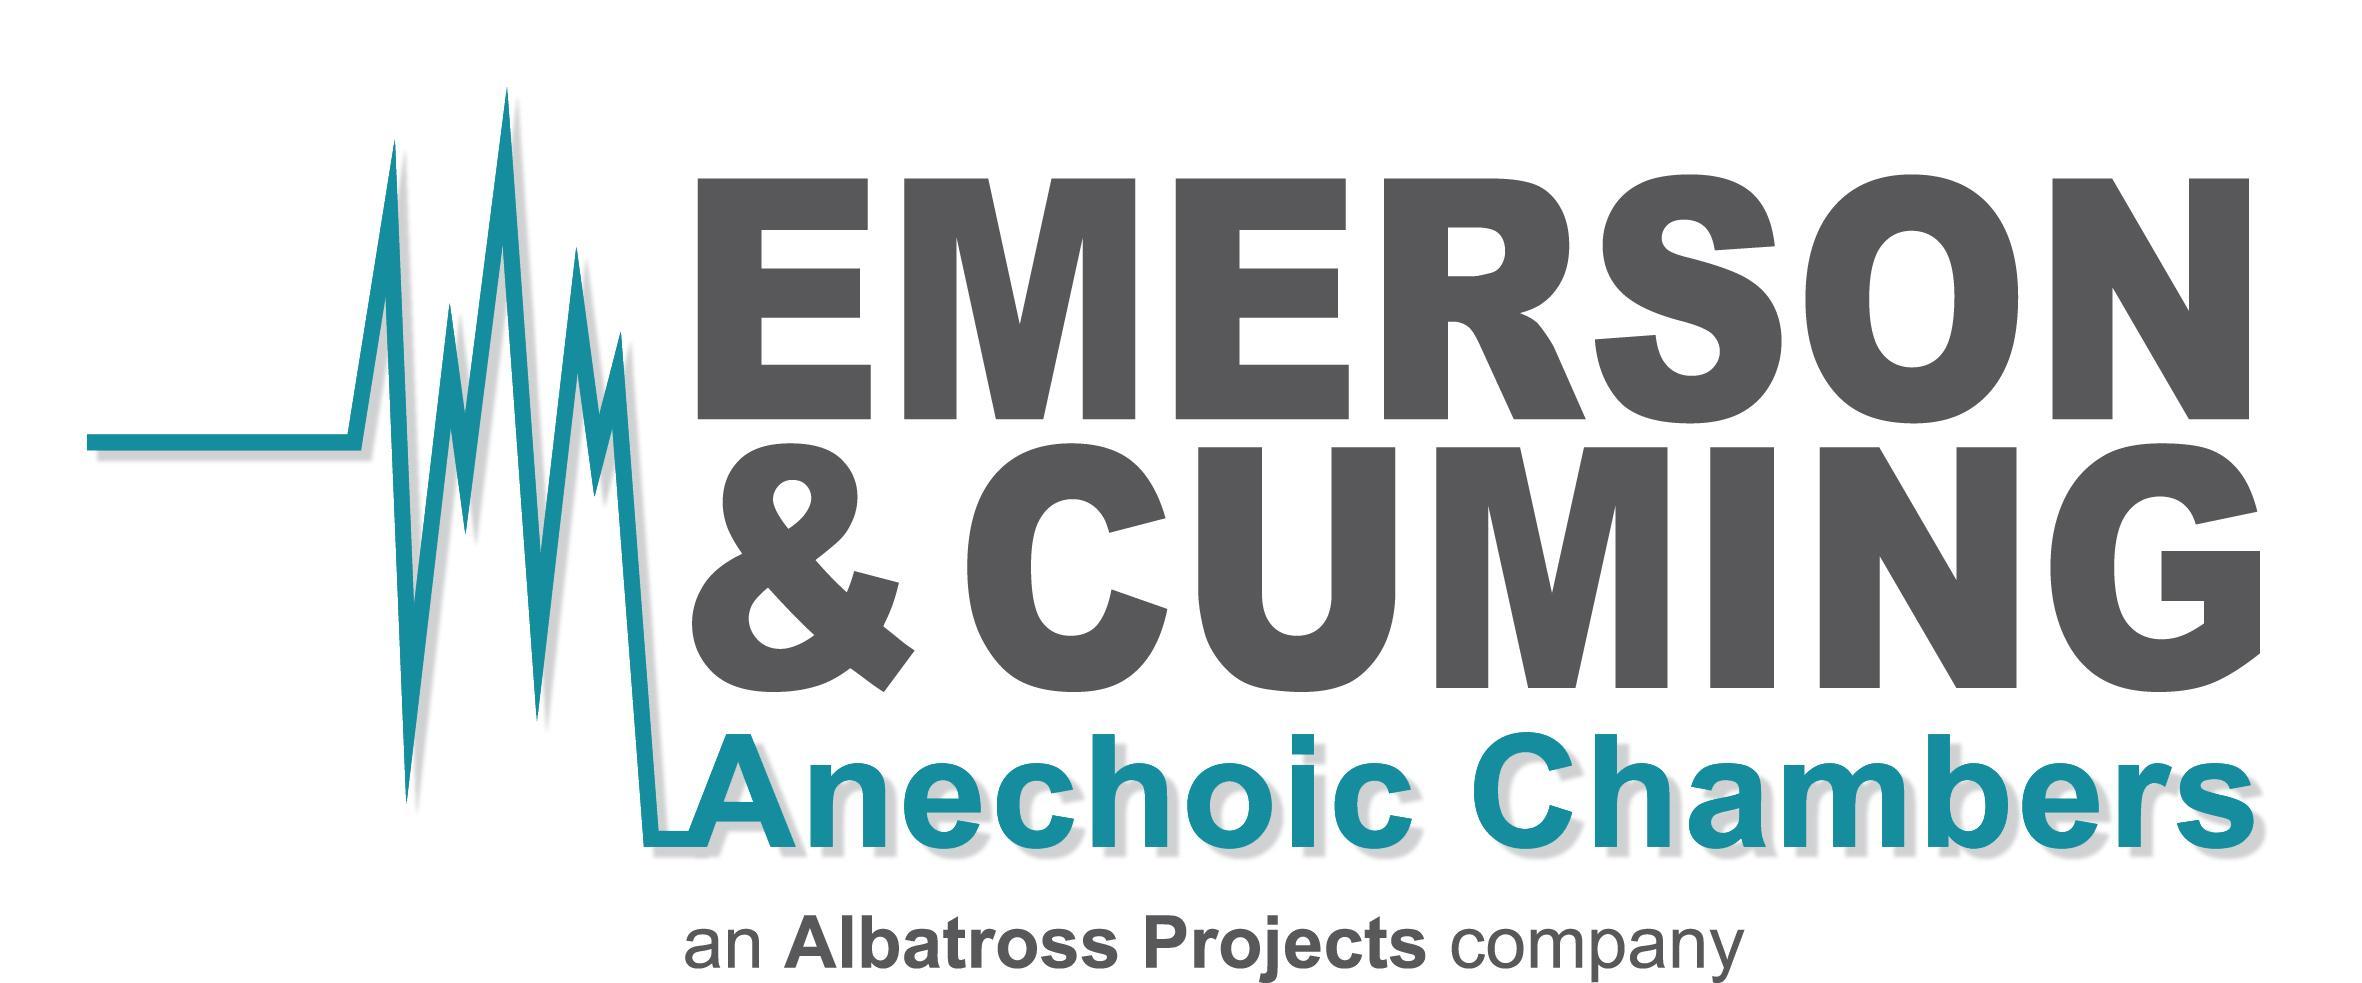 EC Anechoic Chambers NV